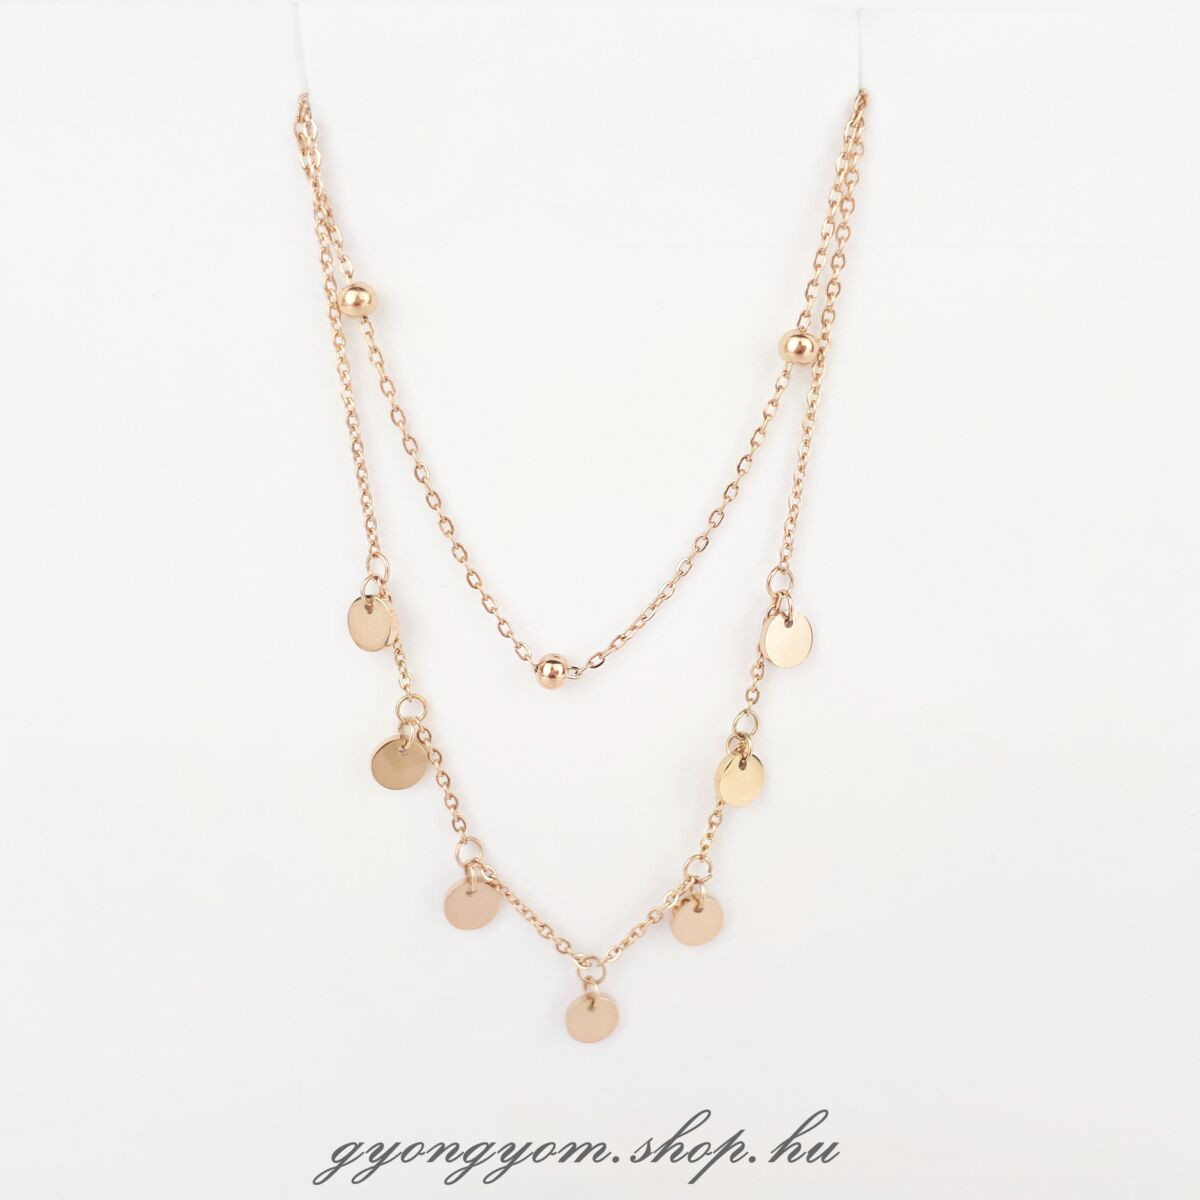 Amabel rozé arany nyaklánc